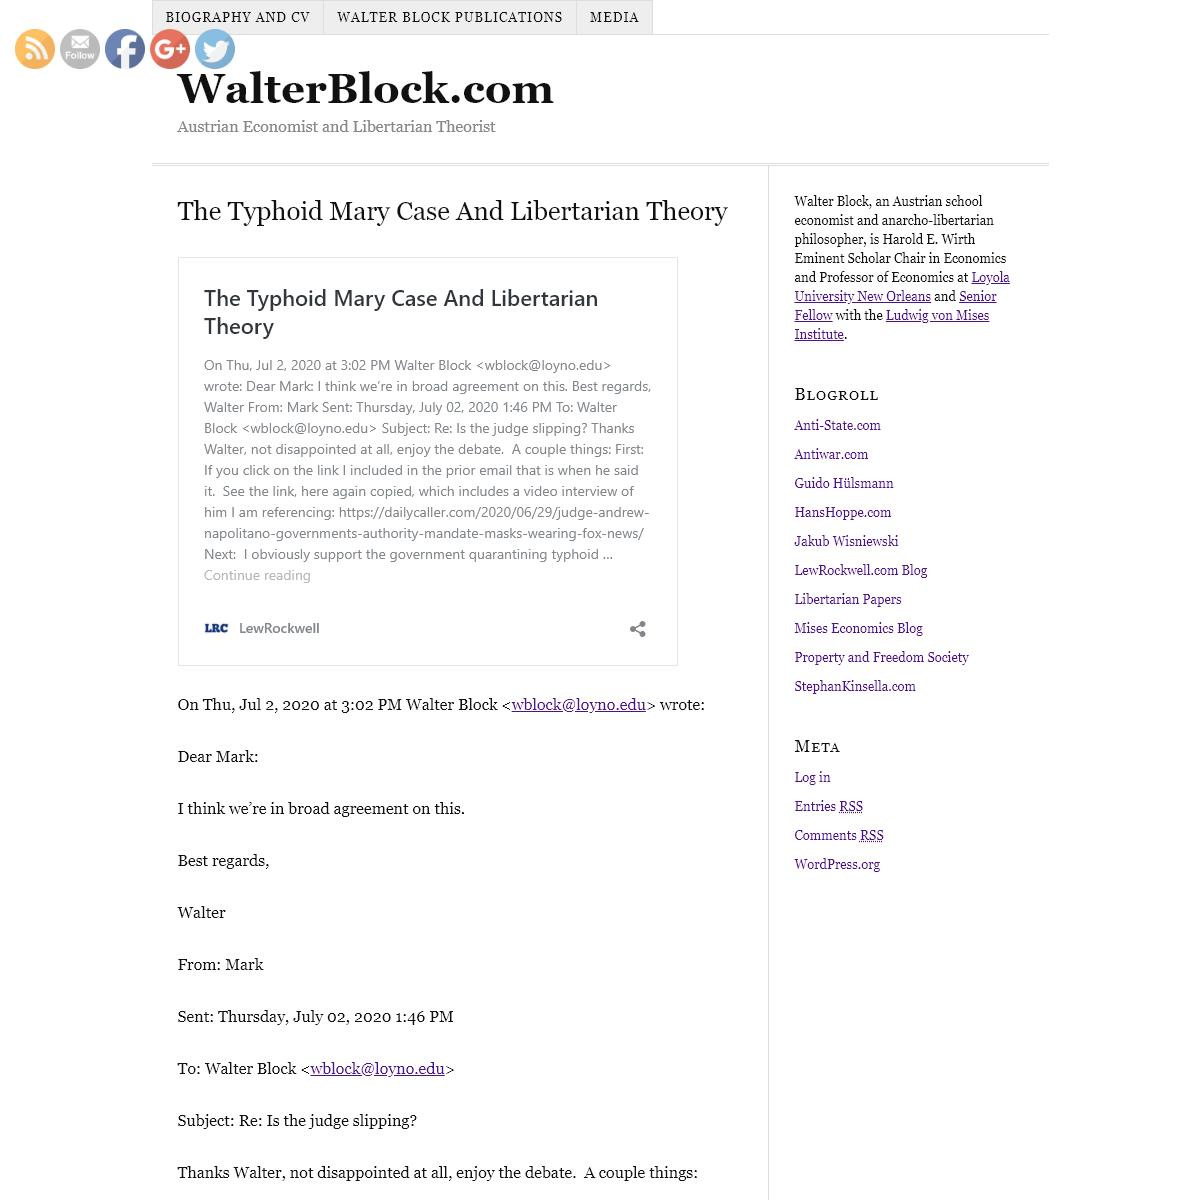 WalterBlock.com — Austrian Economist and Libertarian Theorist